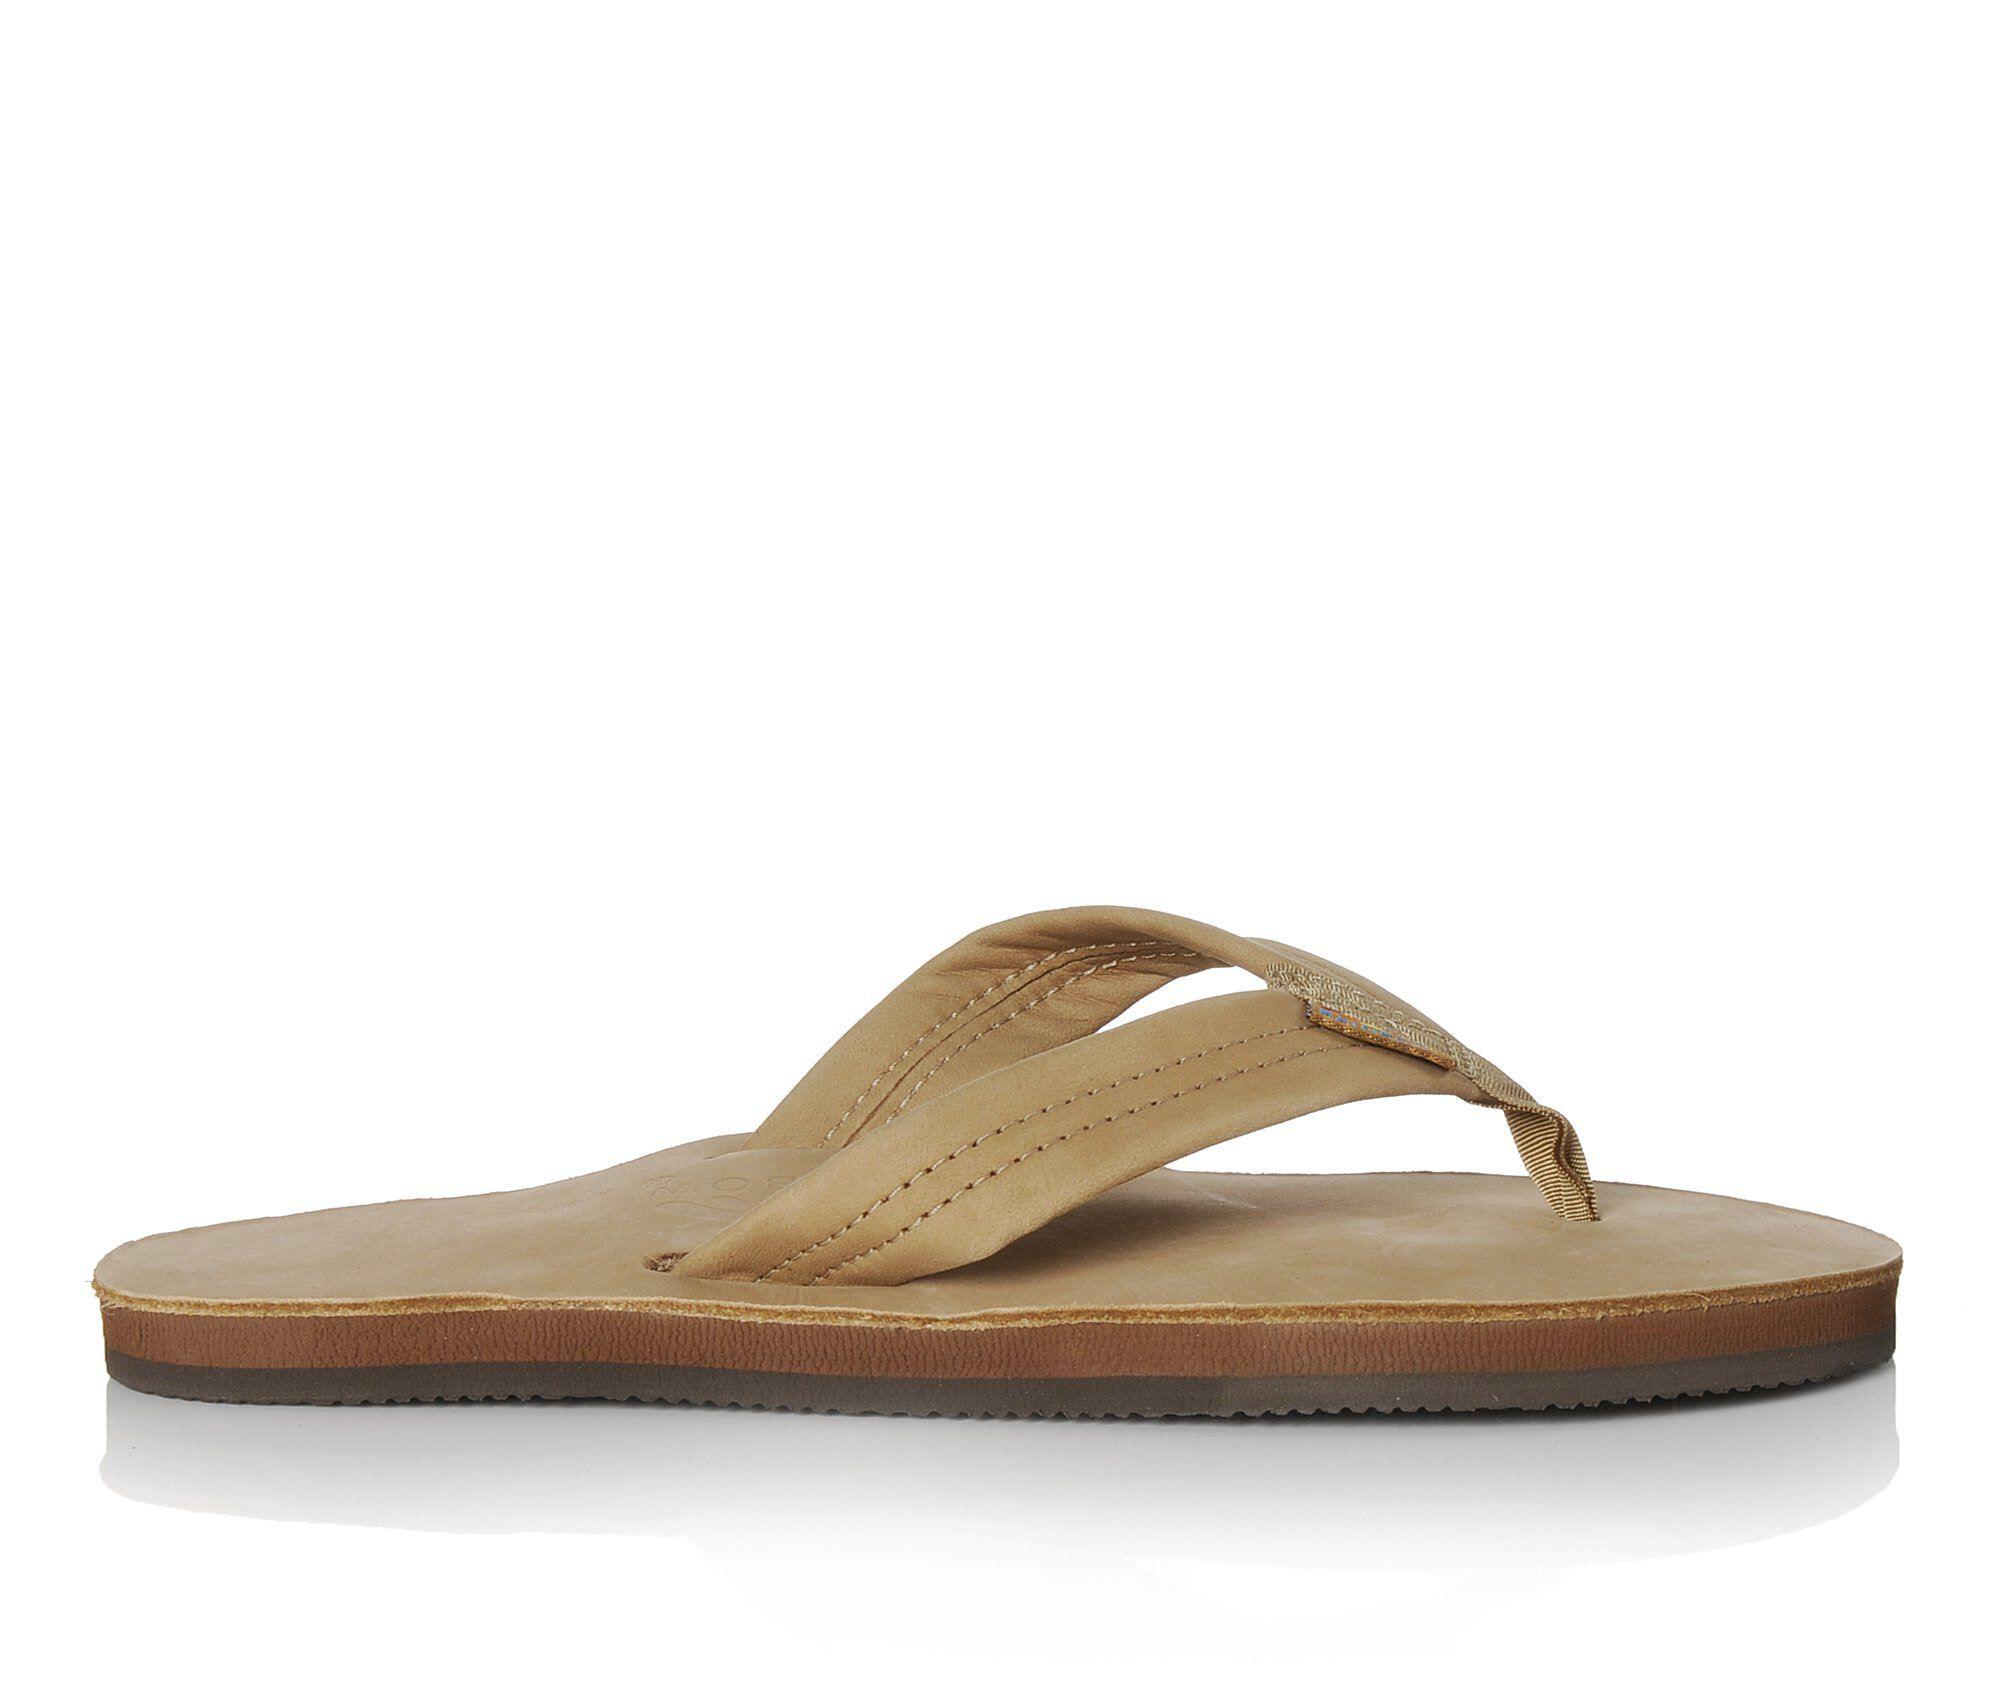 Men's Rainbow Sandals 301 - Premium/Single Flip-Flops clearance excellent outlet cost outlet 100% guaranteed clearance choice 100% original online 4lEhAtIQ